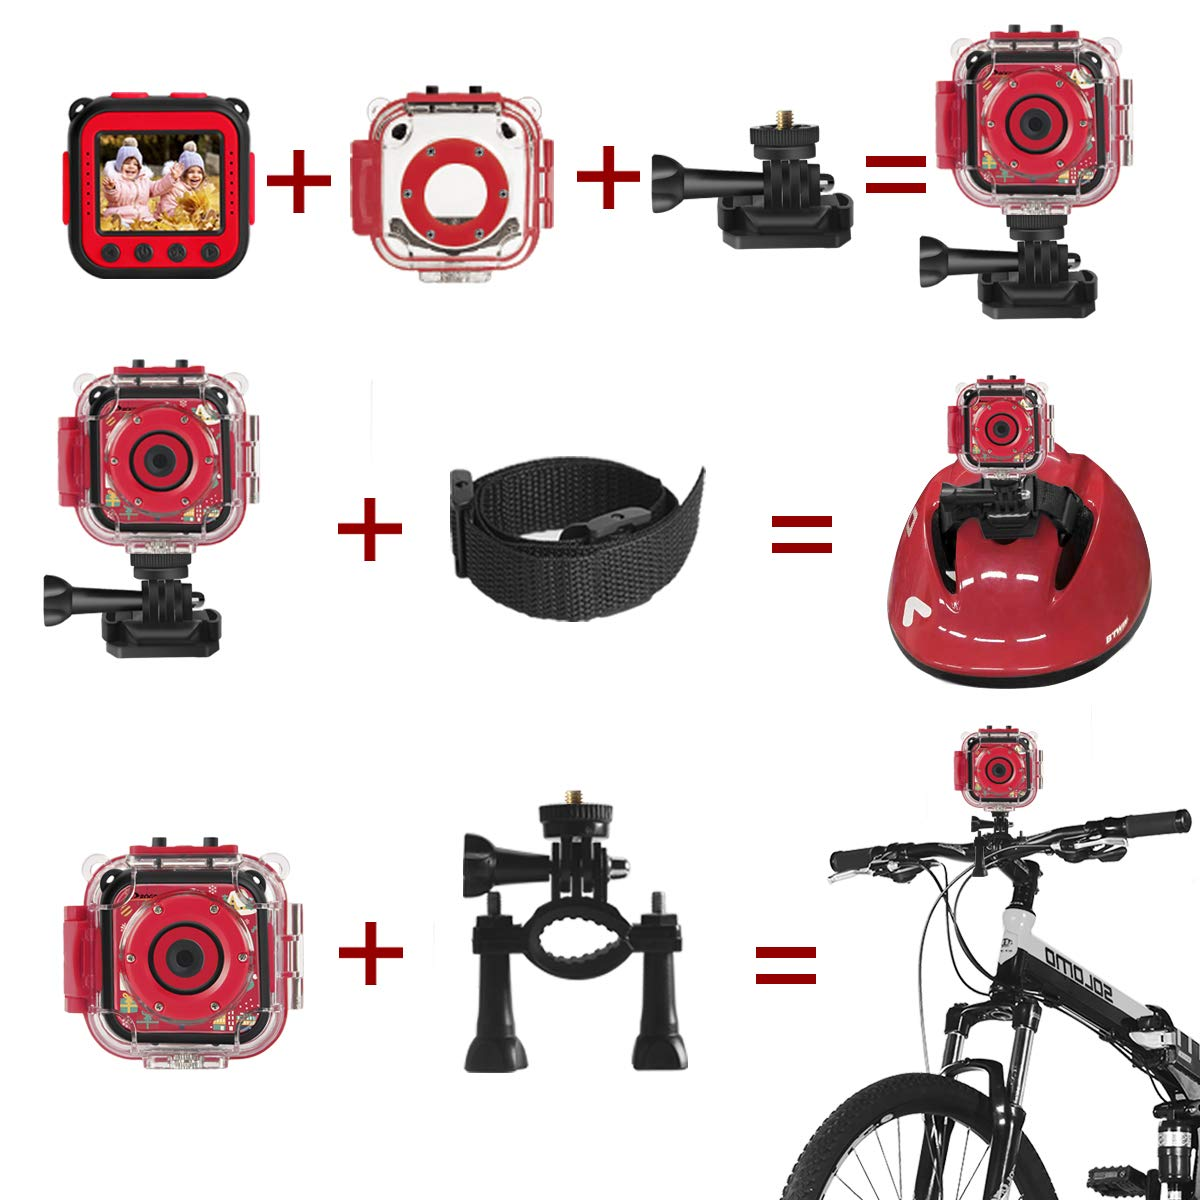 Prograce Kids Camera Underwater Waterproof Camera Camcorder for Boys Girls 4X Digital Zoom 3-Level Volume Adjustment(Red) by Prograce (Image #6)